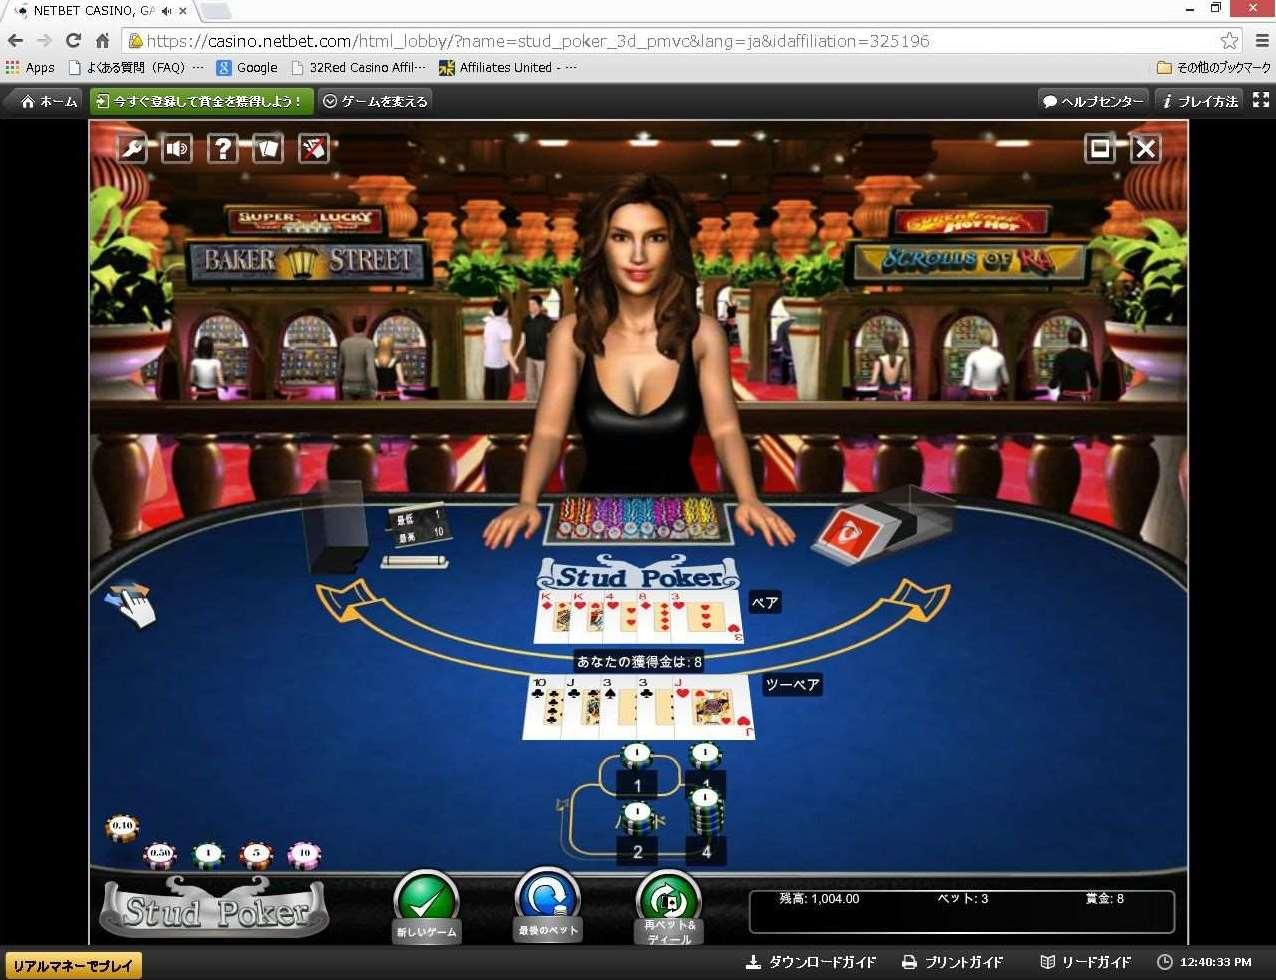 NetBet Stud Poker 3D